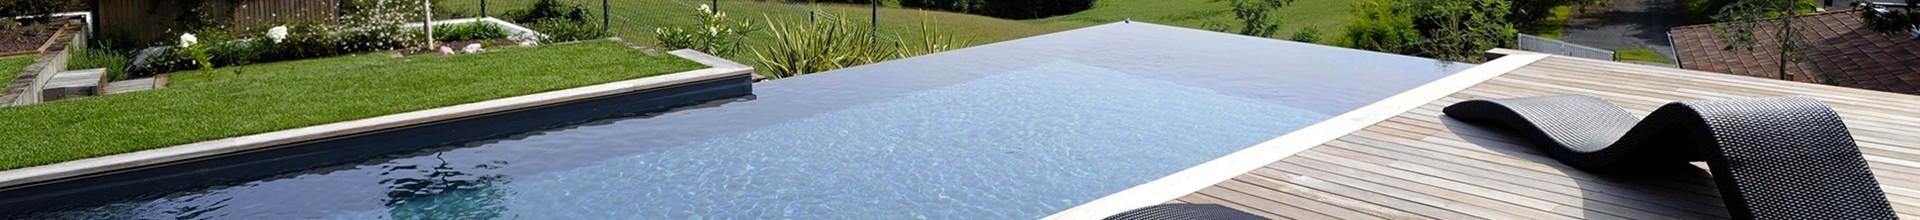 ✅ Rhône Alpes Kit piscine béton Rhône. Fabricant